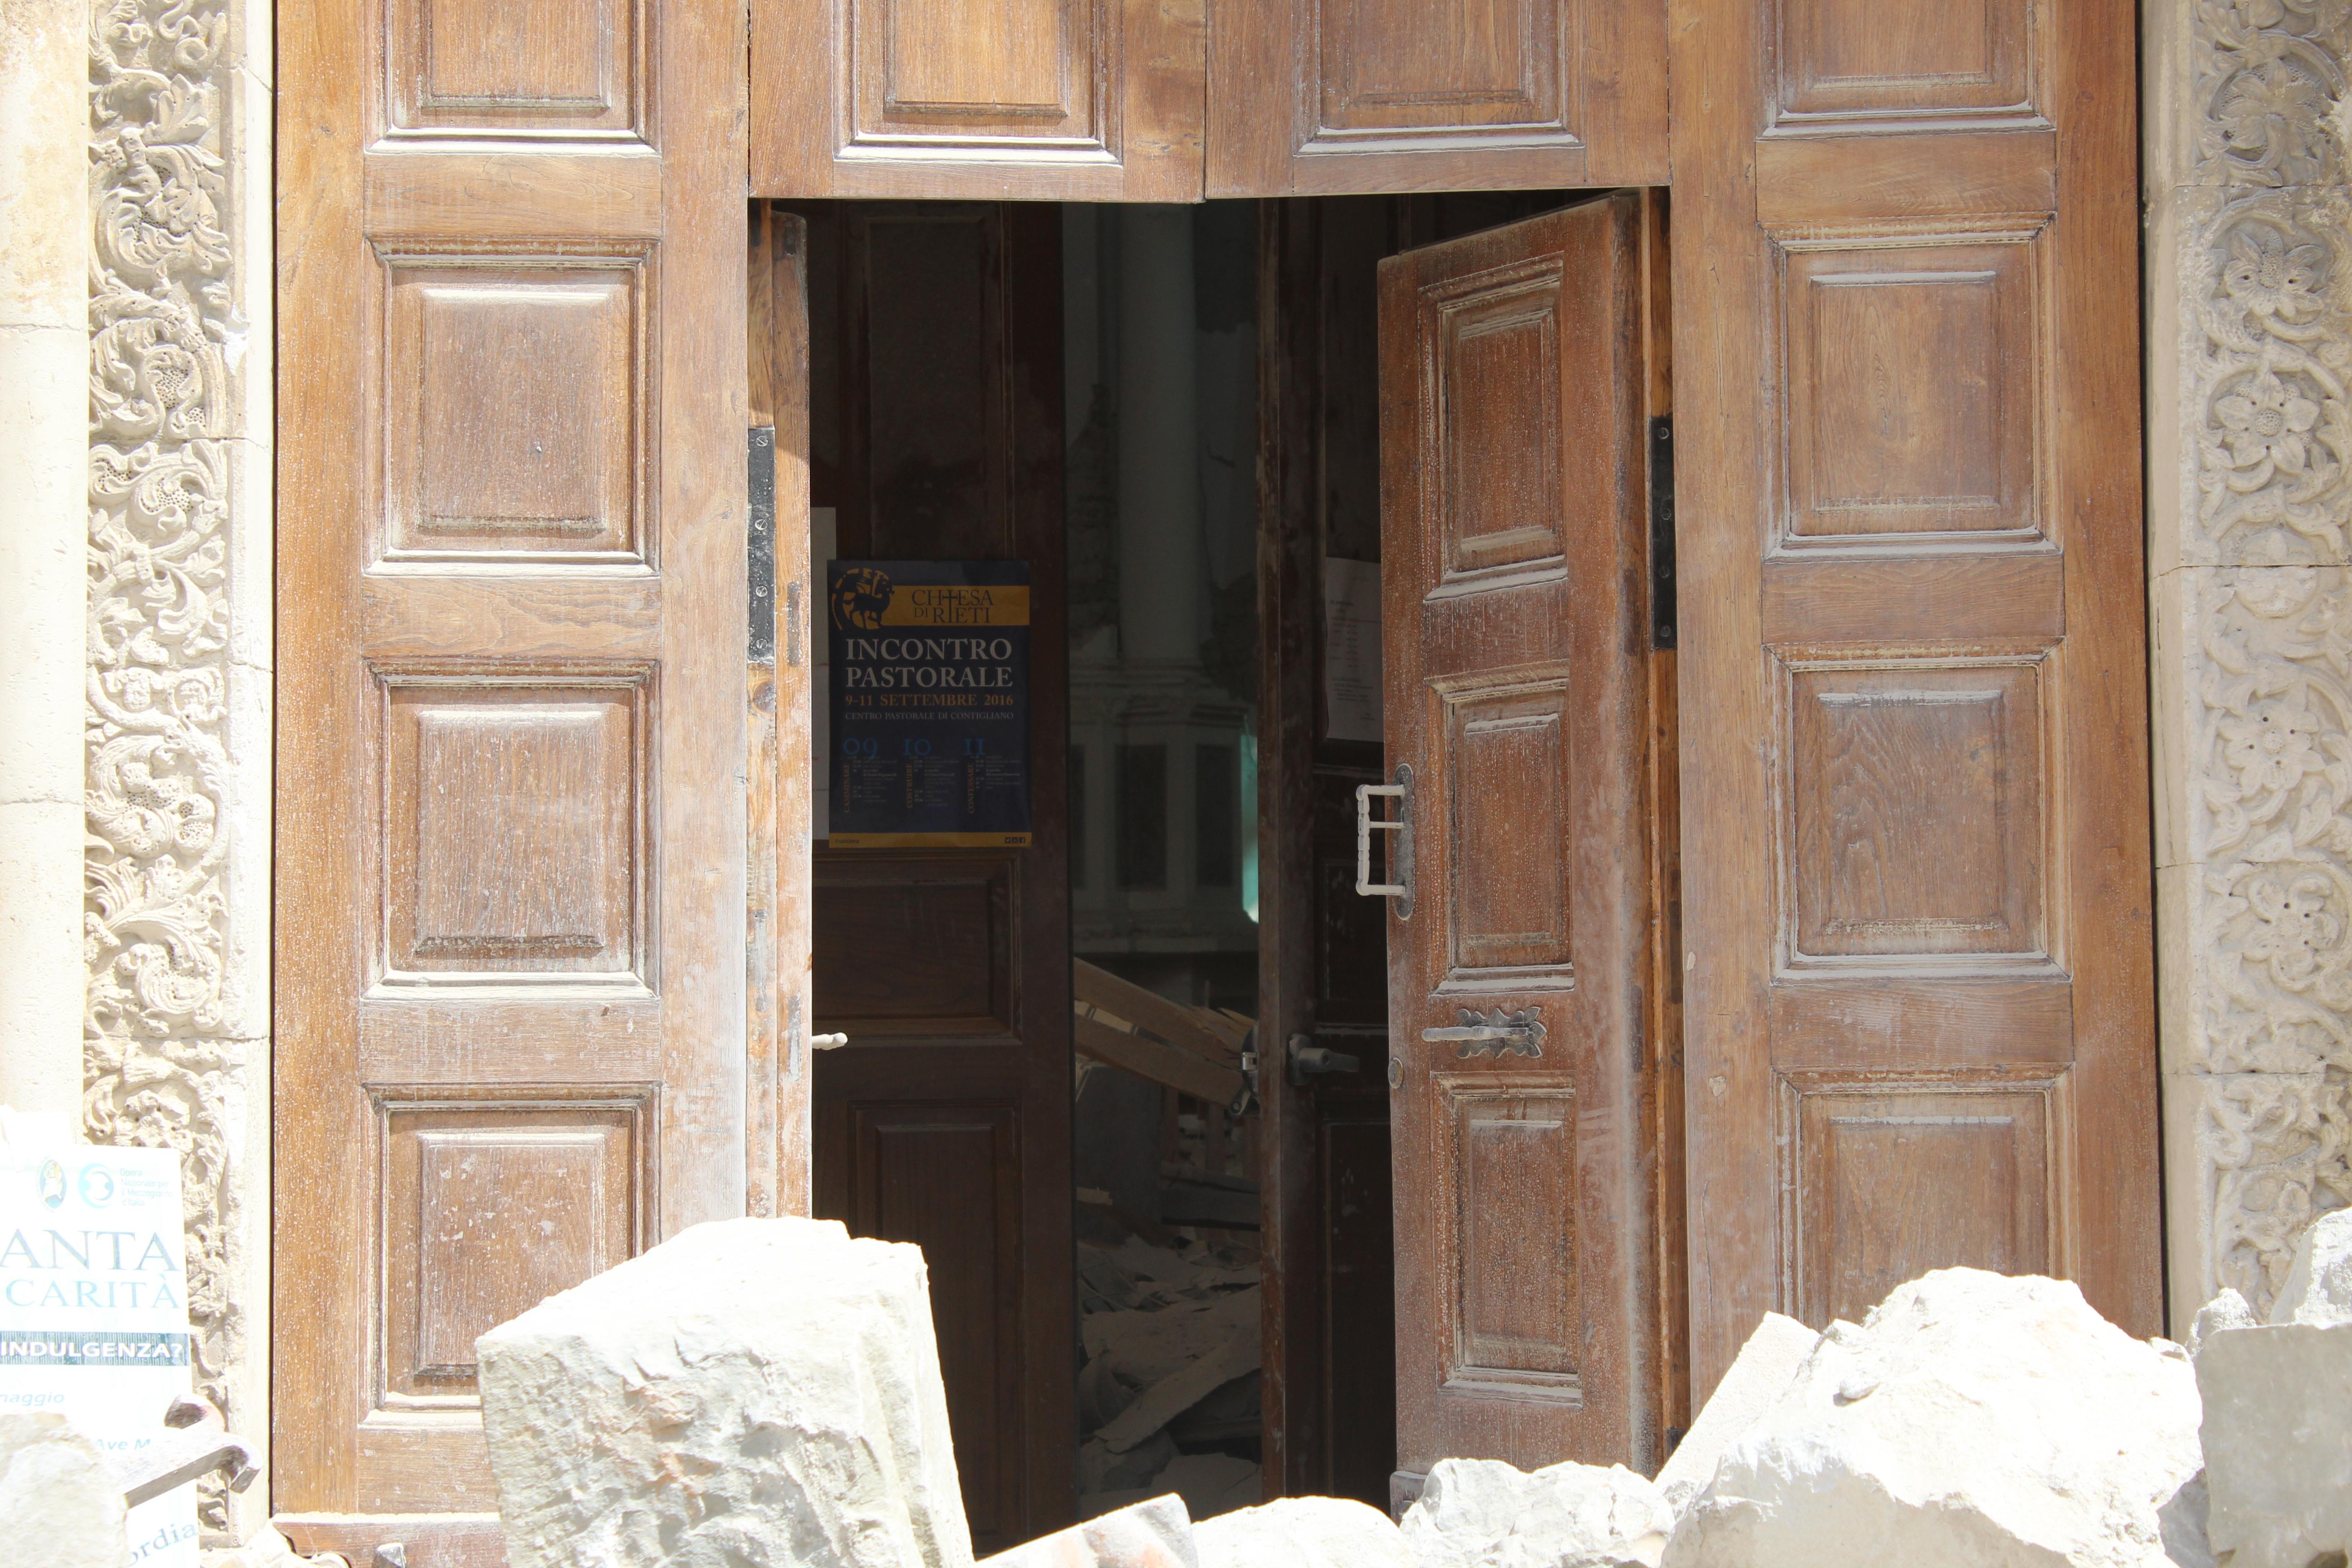 Reportage terremoto- foto Diego Renzi